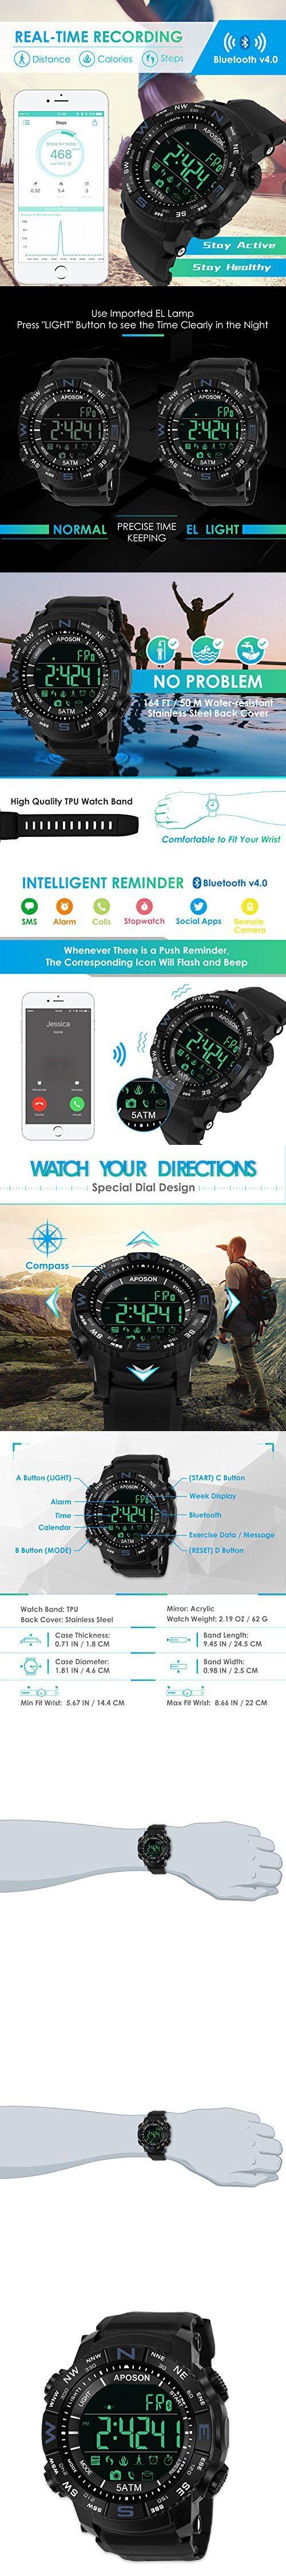 Men Sports Smart Bluetooth Watch, Pedometer Calories Waterproof LED Digital Watch Fitness Running Bracelet Chronograph 50M Waterproof Wristwatches Fashion Chronograph Watches